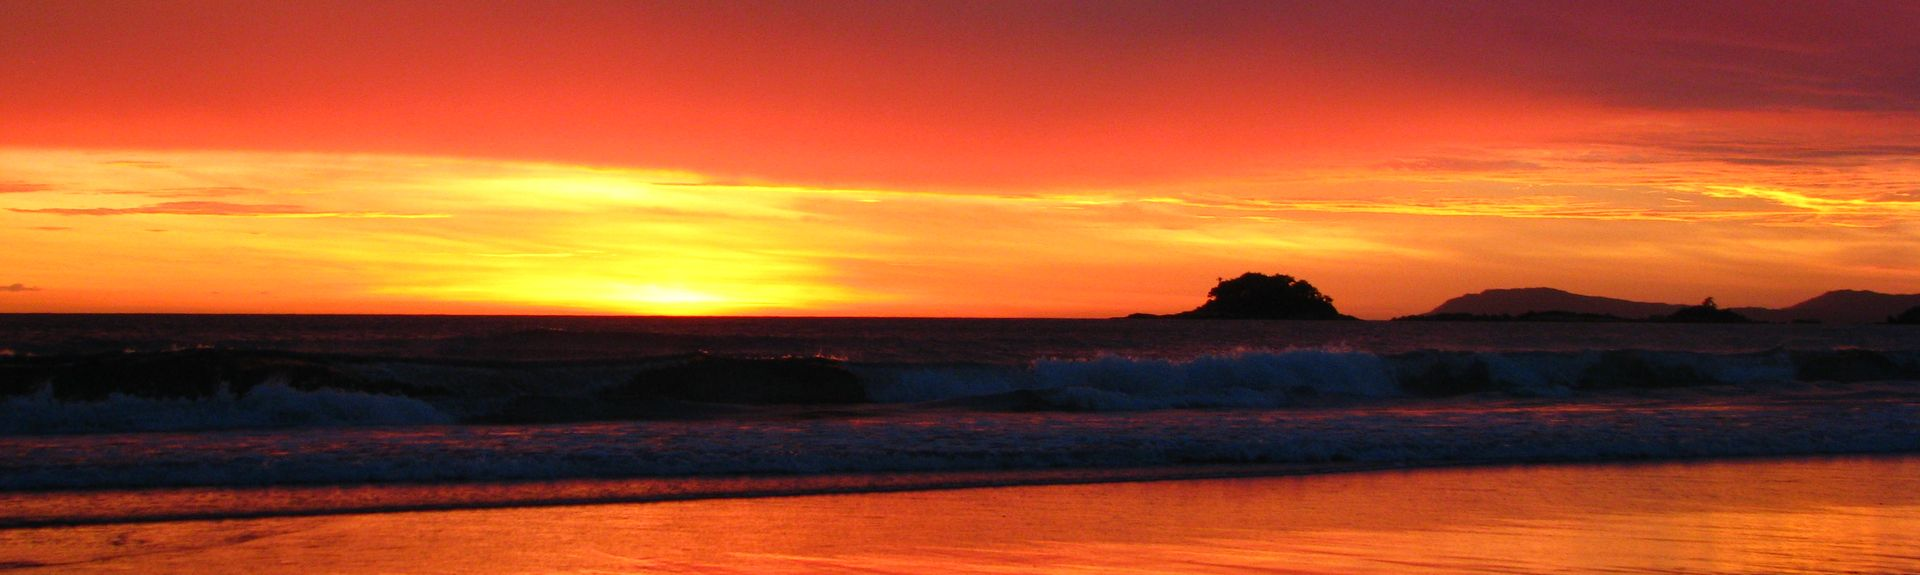 Ilha de Santa Catarina, Região Sul, Brasil